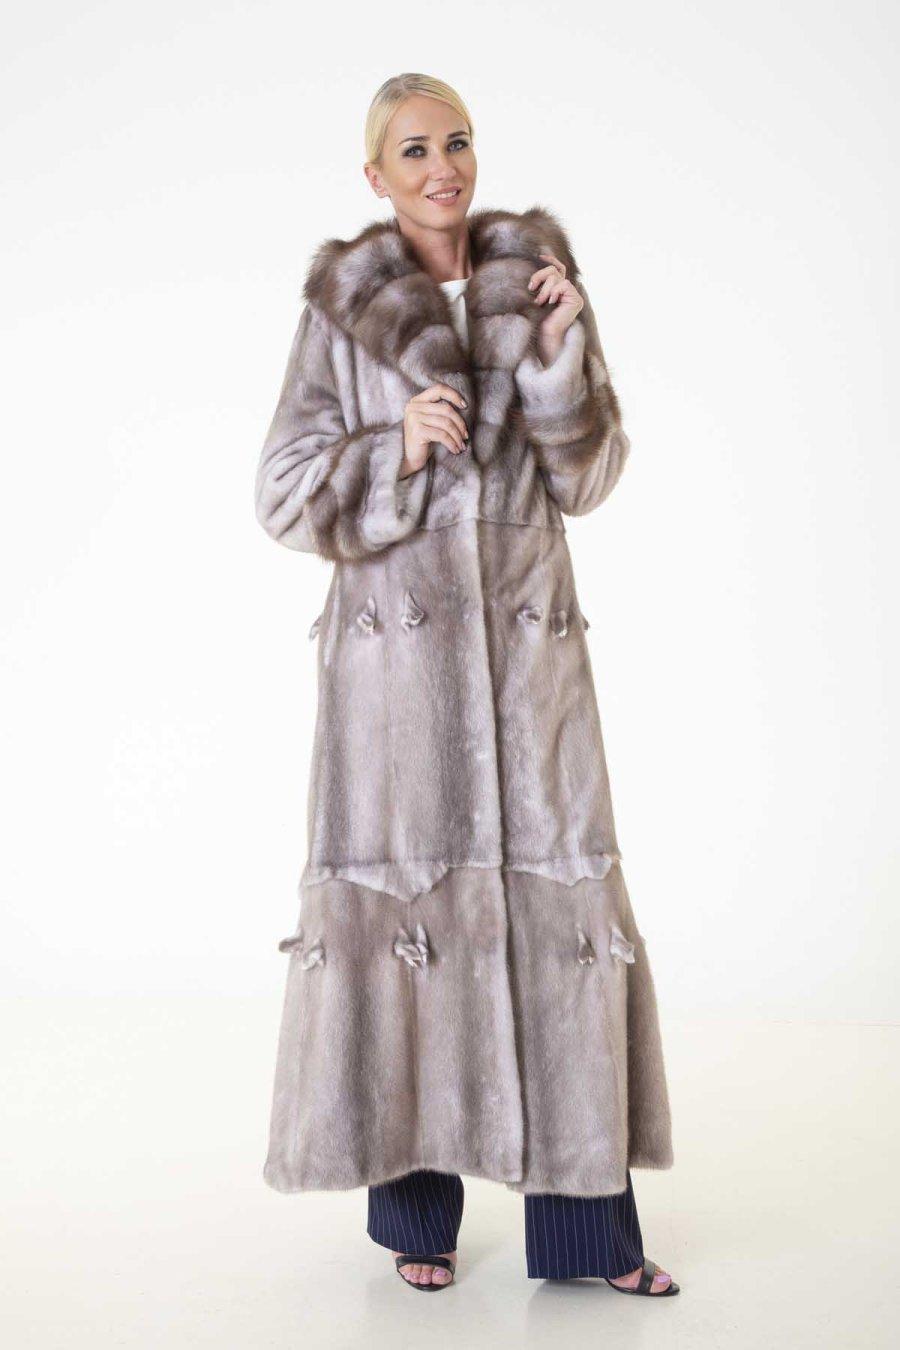 Ice Fume Female Mink Coat with Hood | Шуба из норки с капюшоном цвета Колотый Лёд - Sarigianni Furs